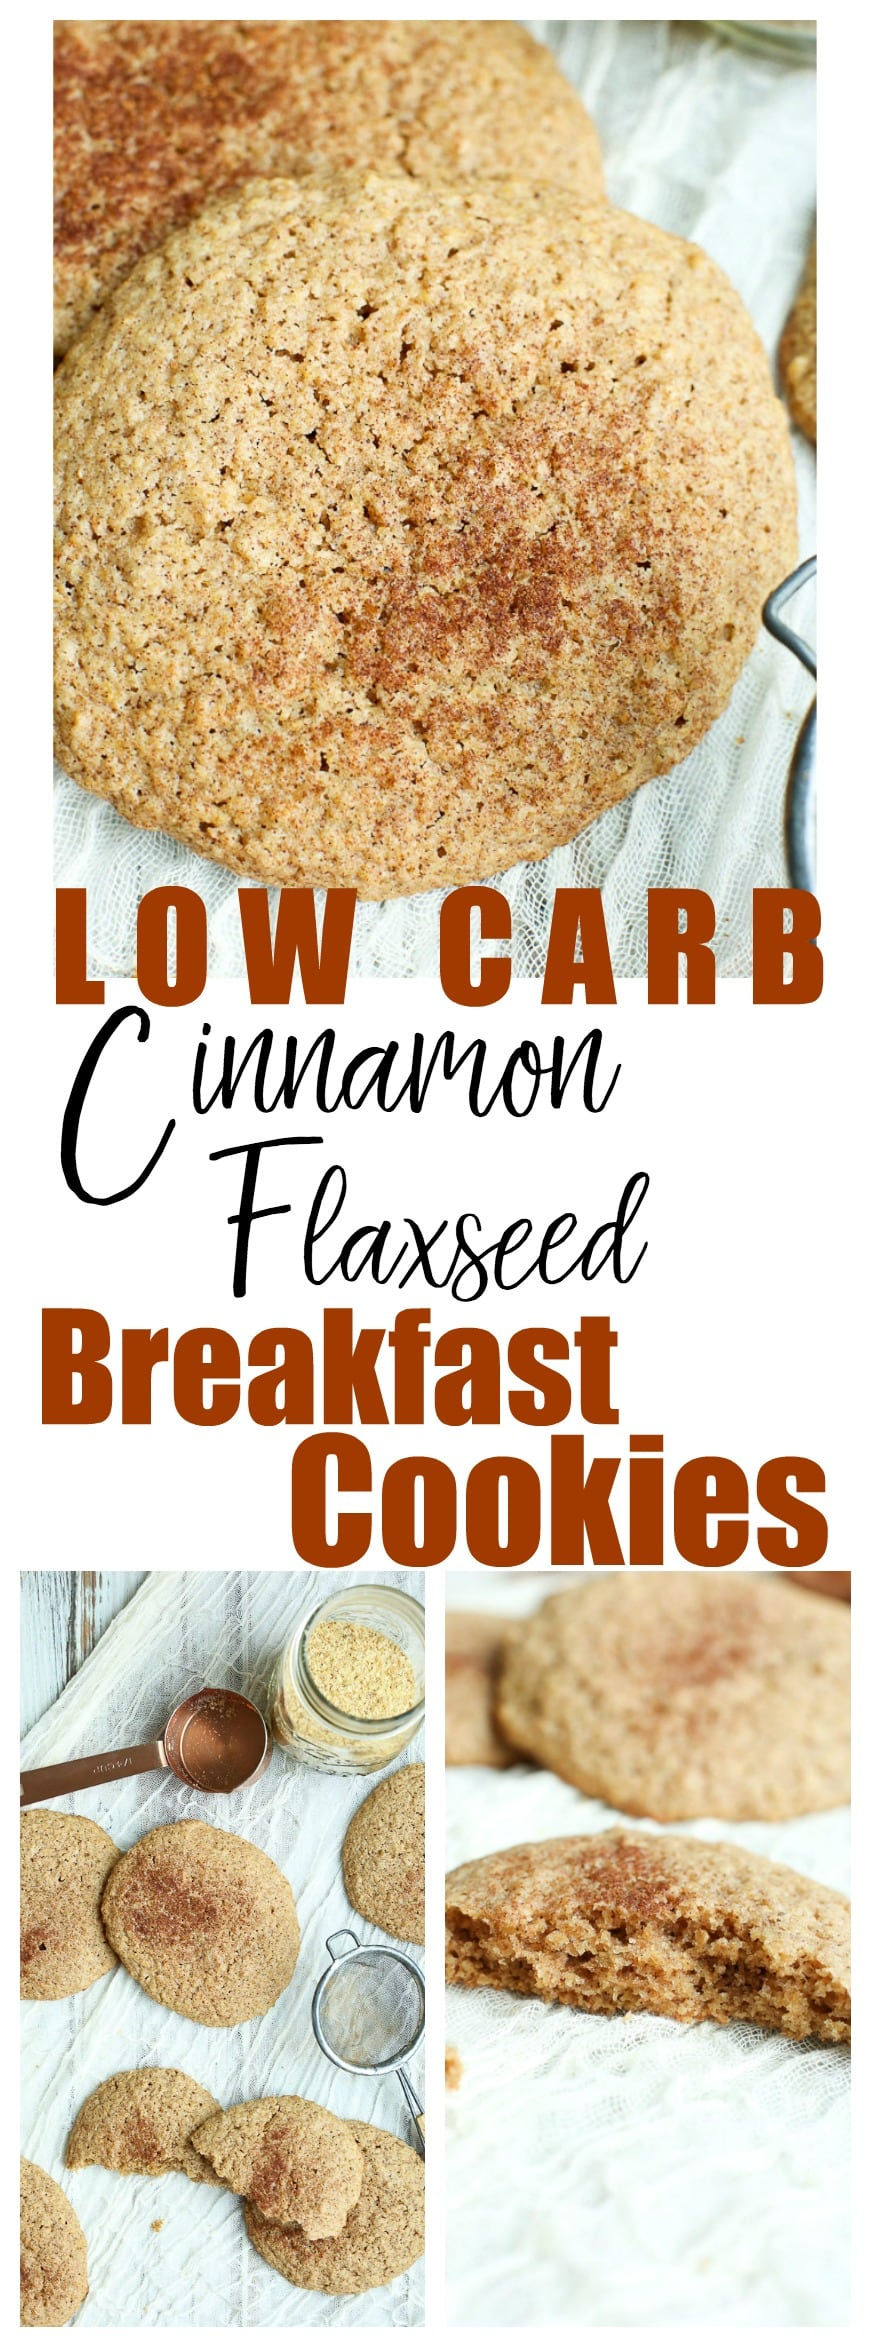 Low Carb Flaxseed Cinnamon Breakfast cookies. Healthy breakfast idea, gluten-free, easy